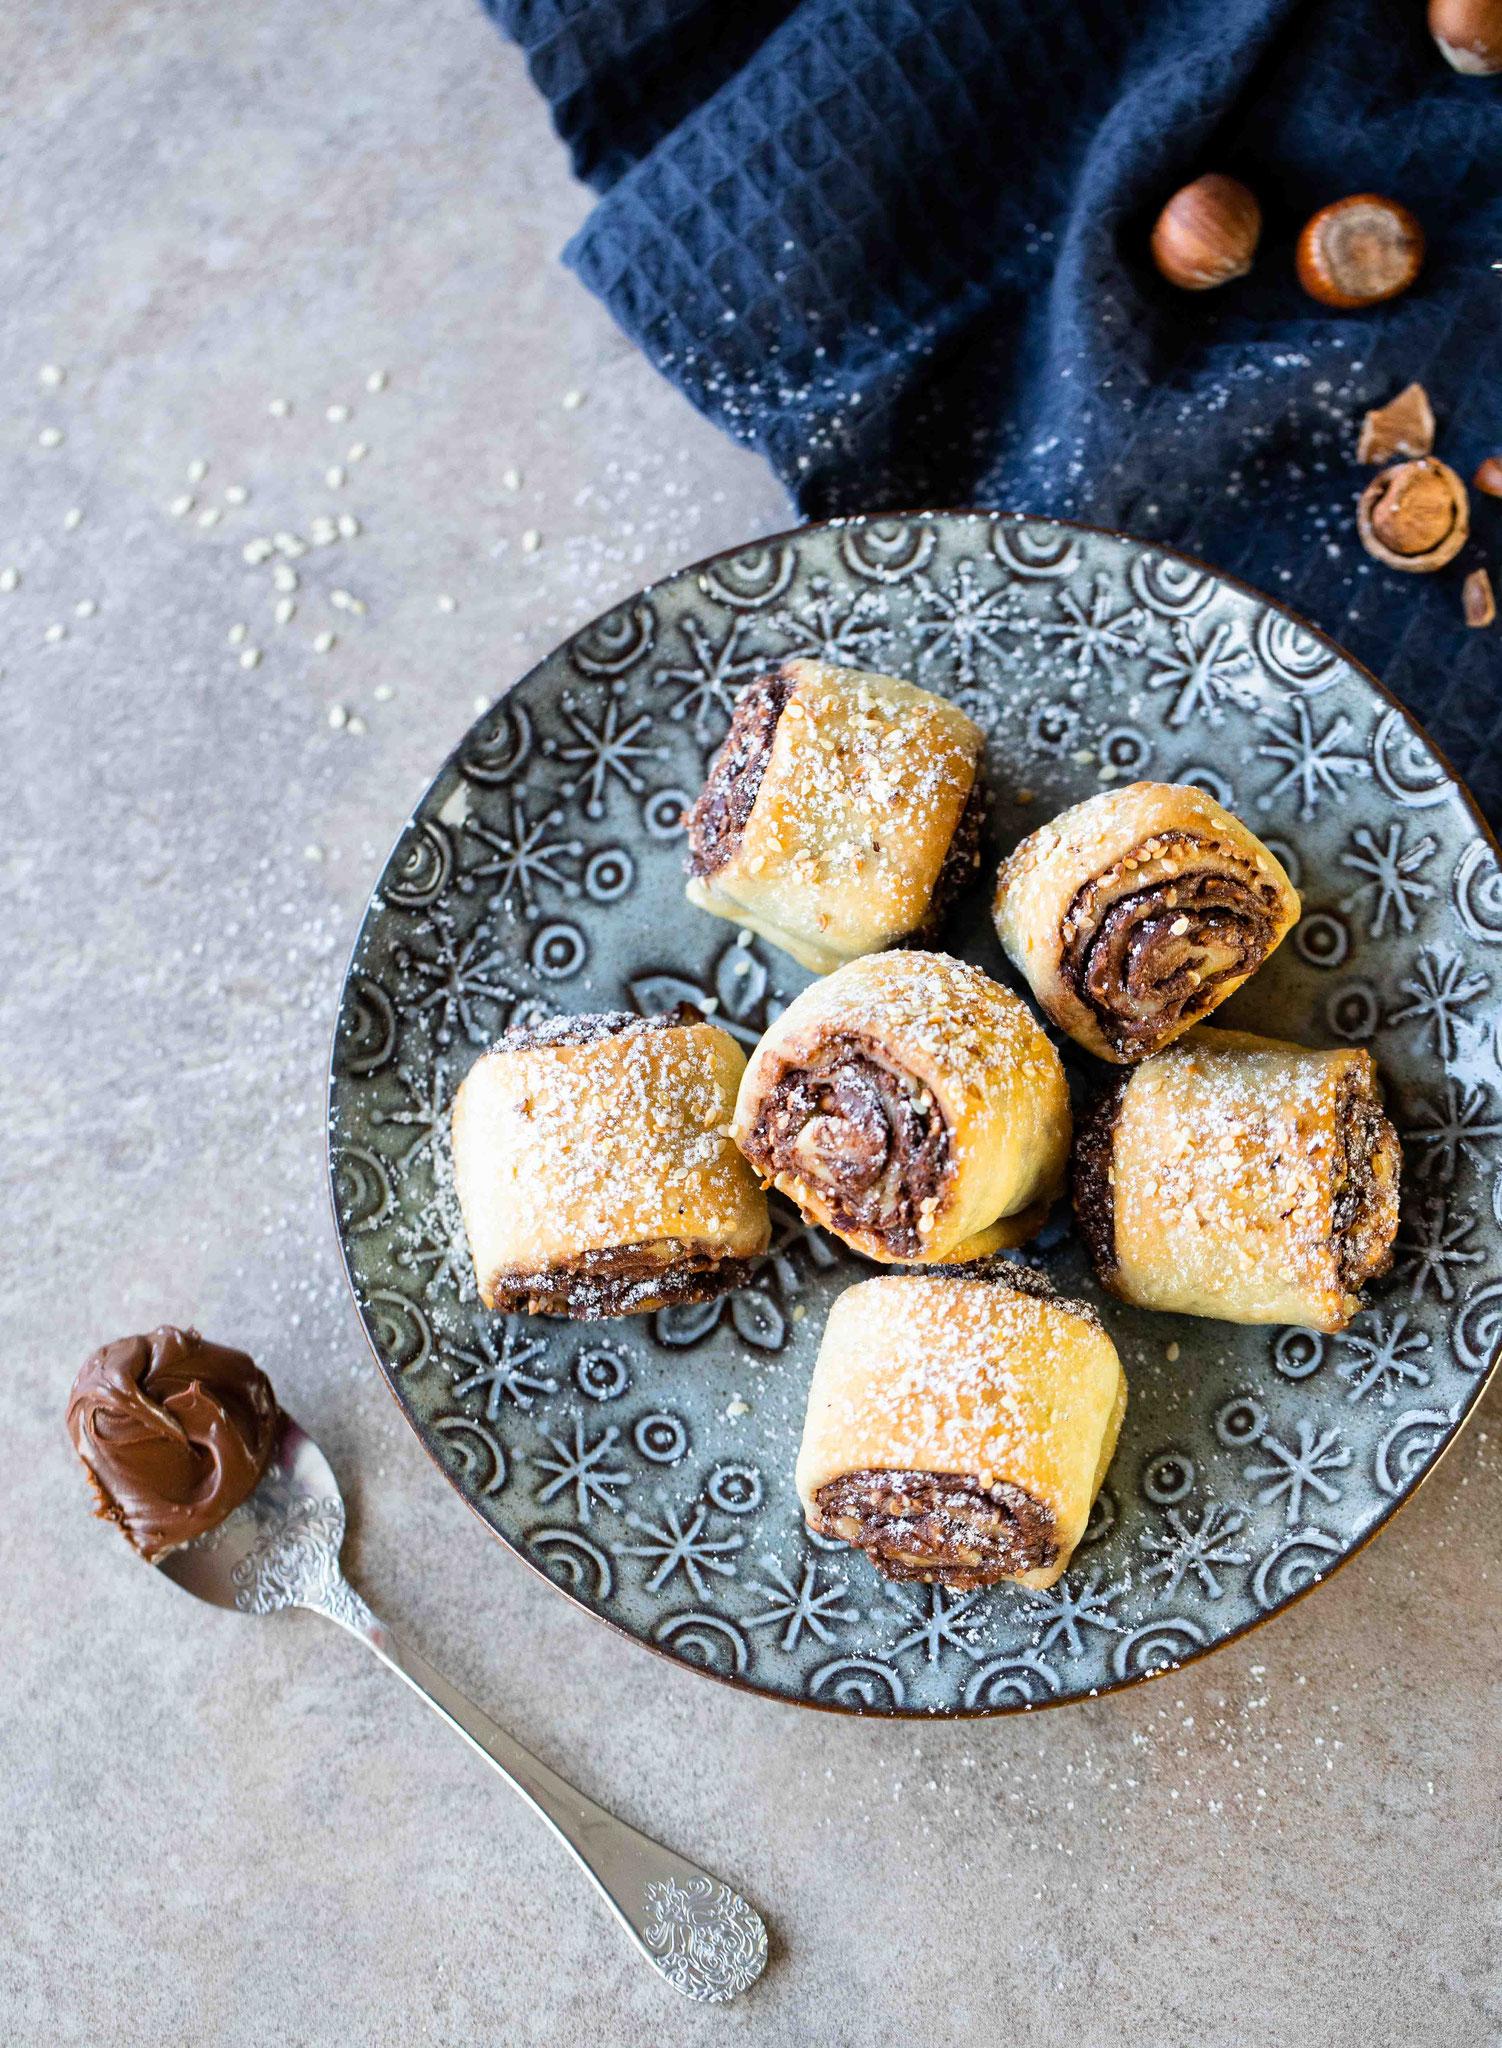 Pâtisserie orientale : recette au chocolat